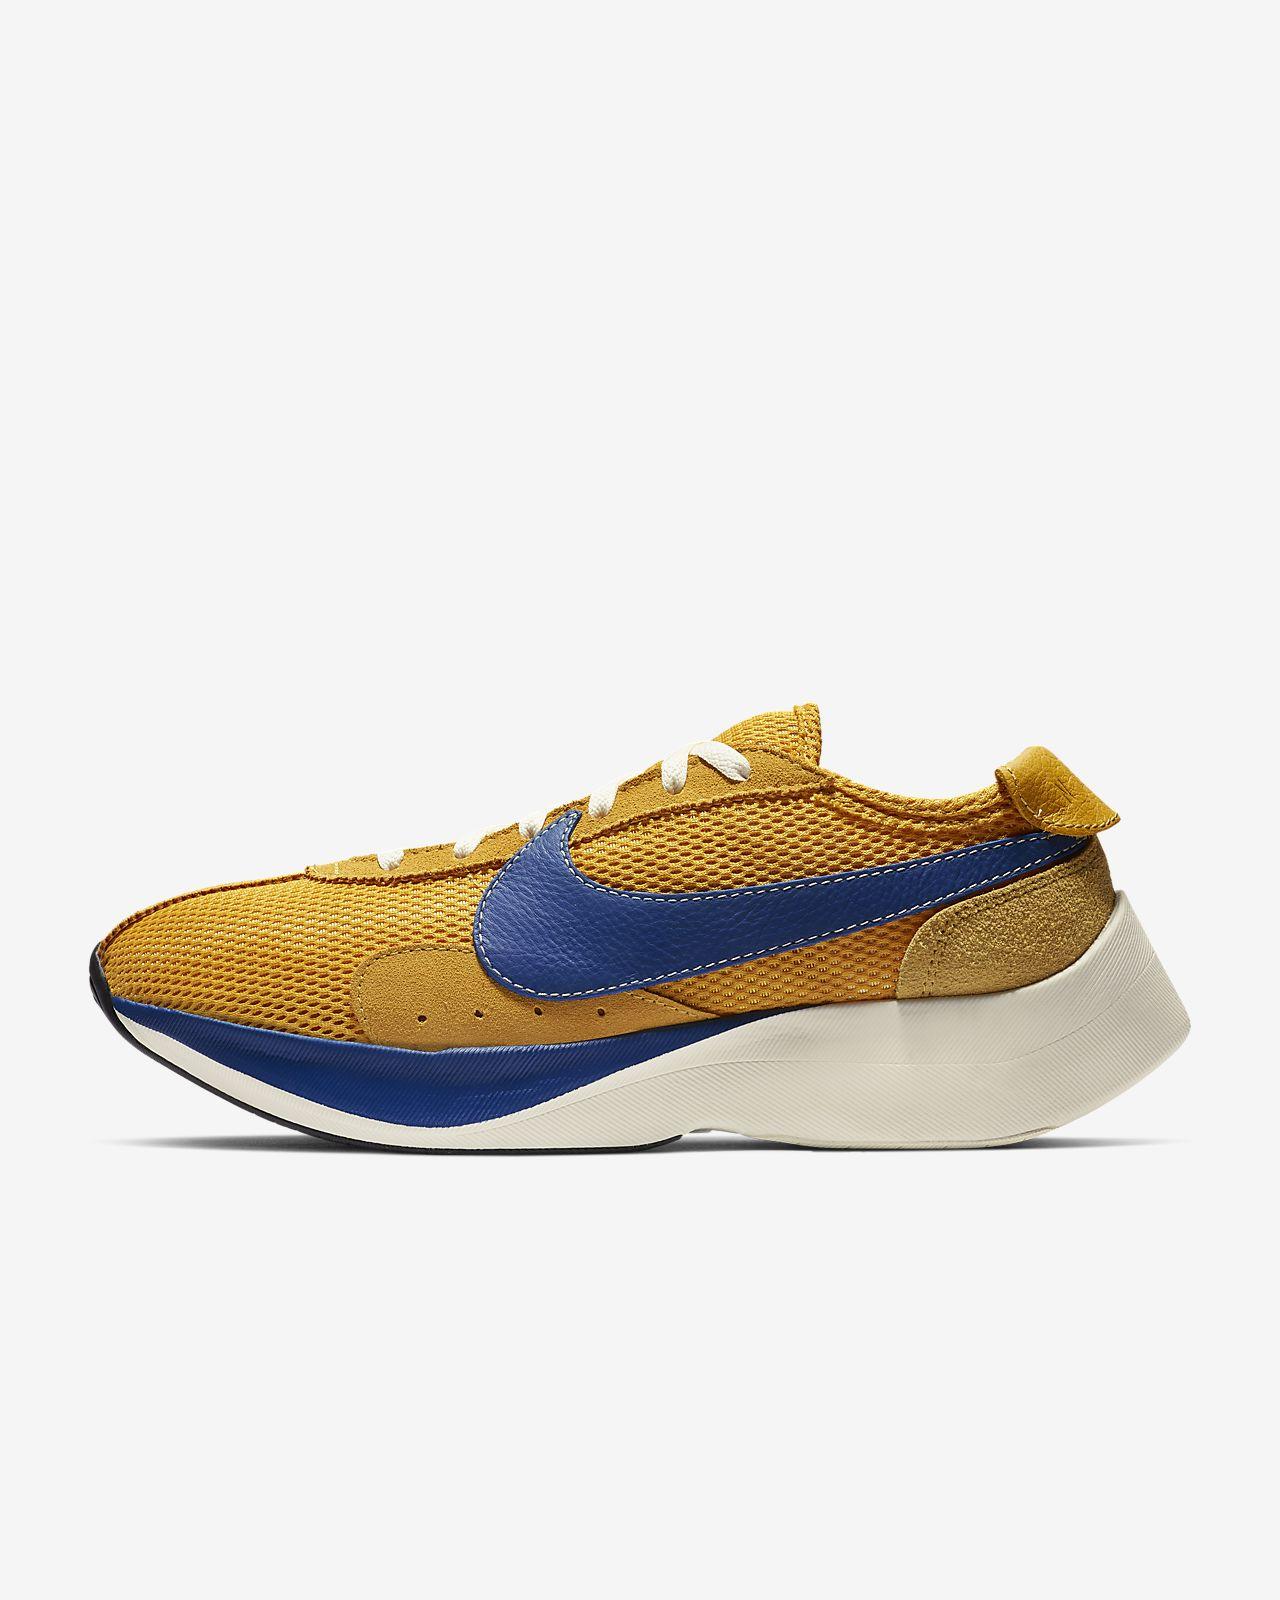 Nike Moon Racer QS Men's Shoe